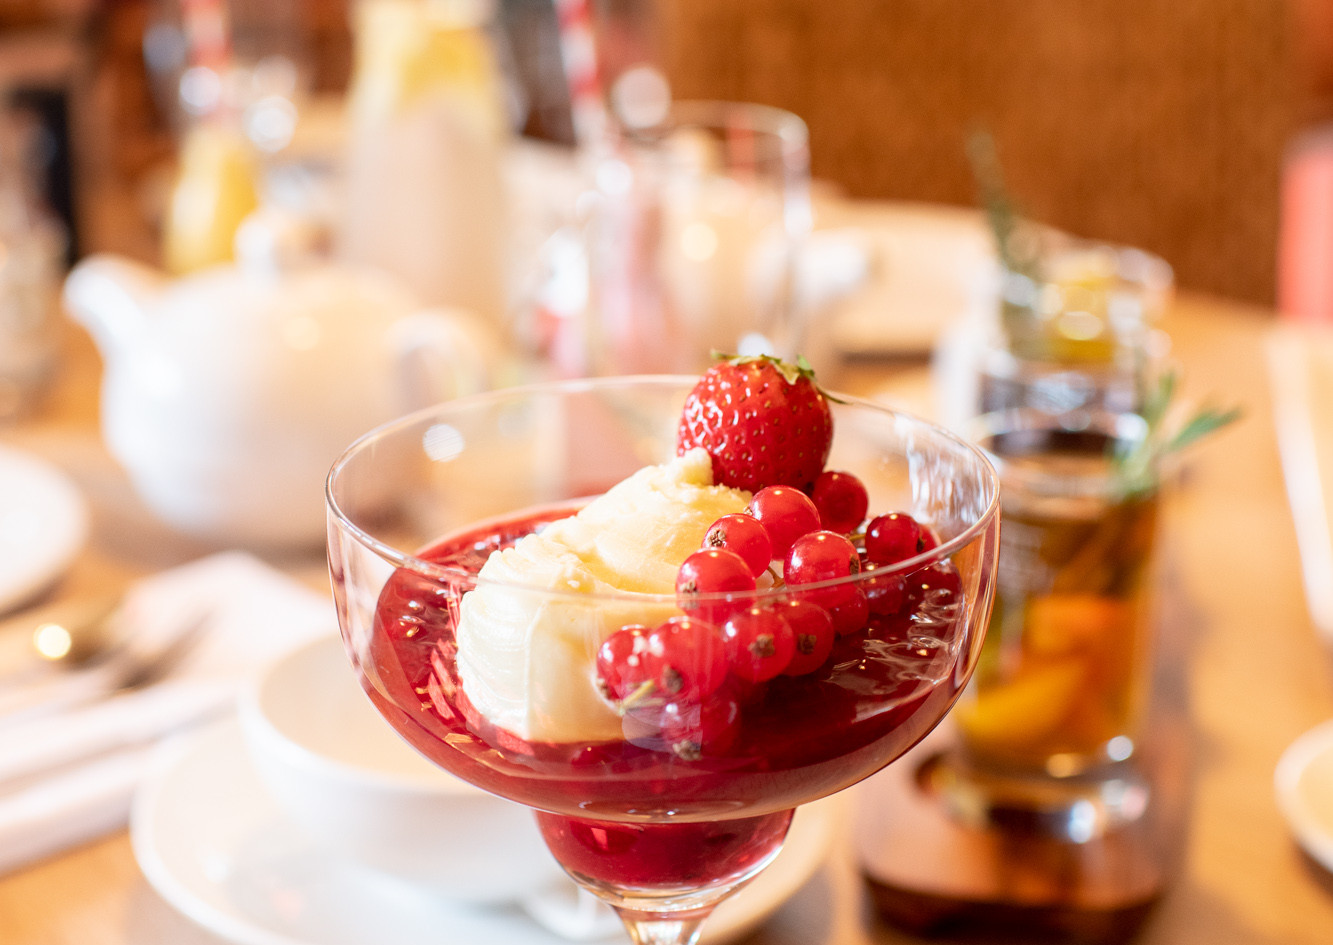 Süßes Dessert Afternoon Tea